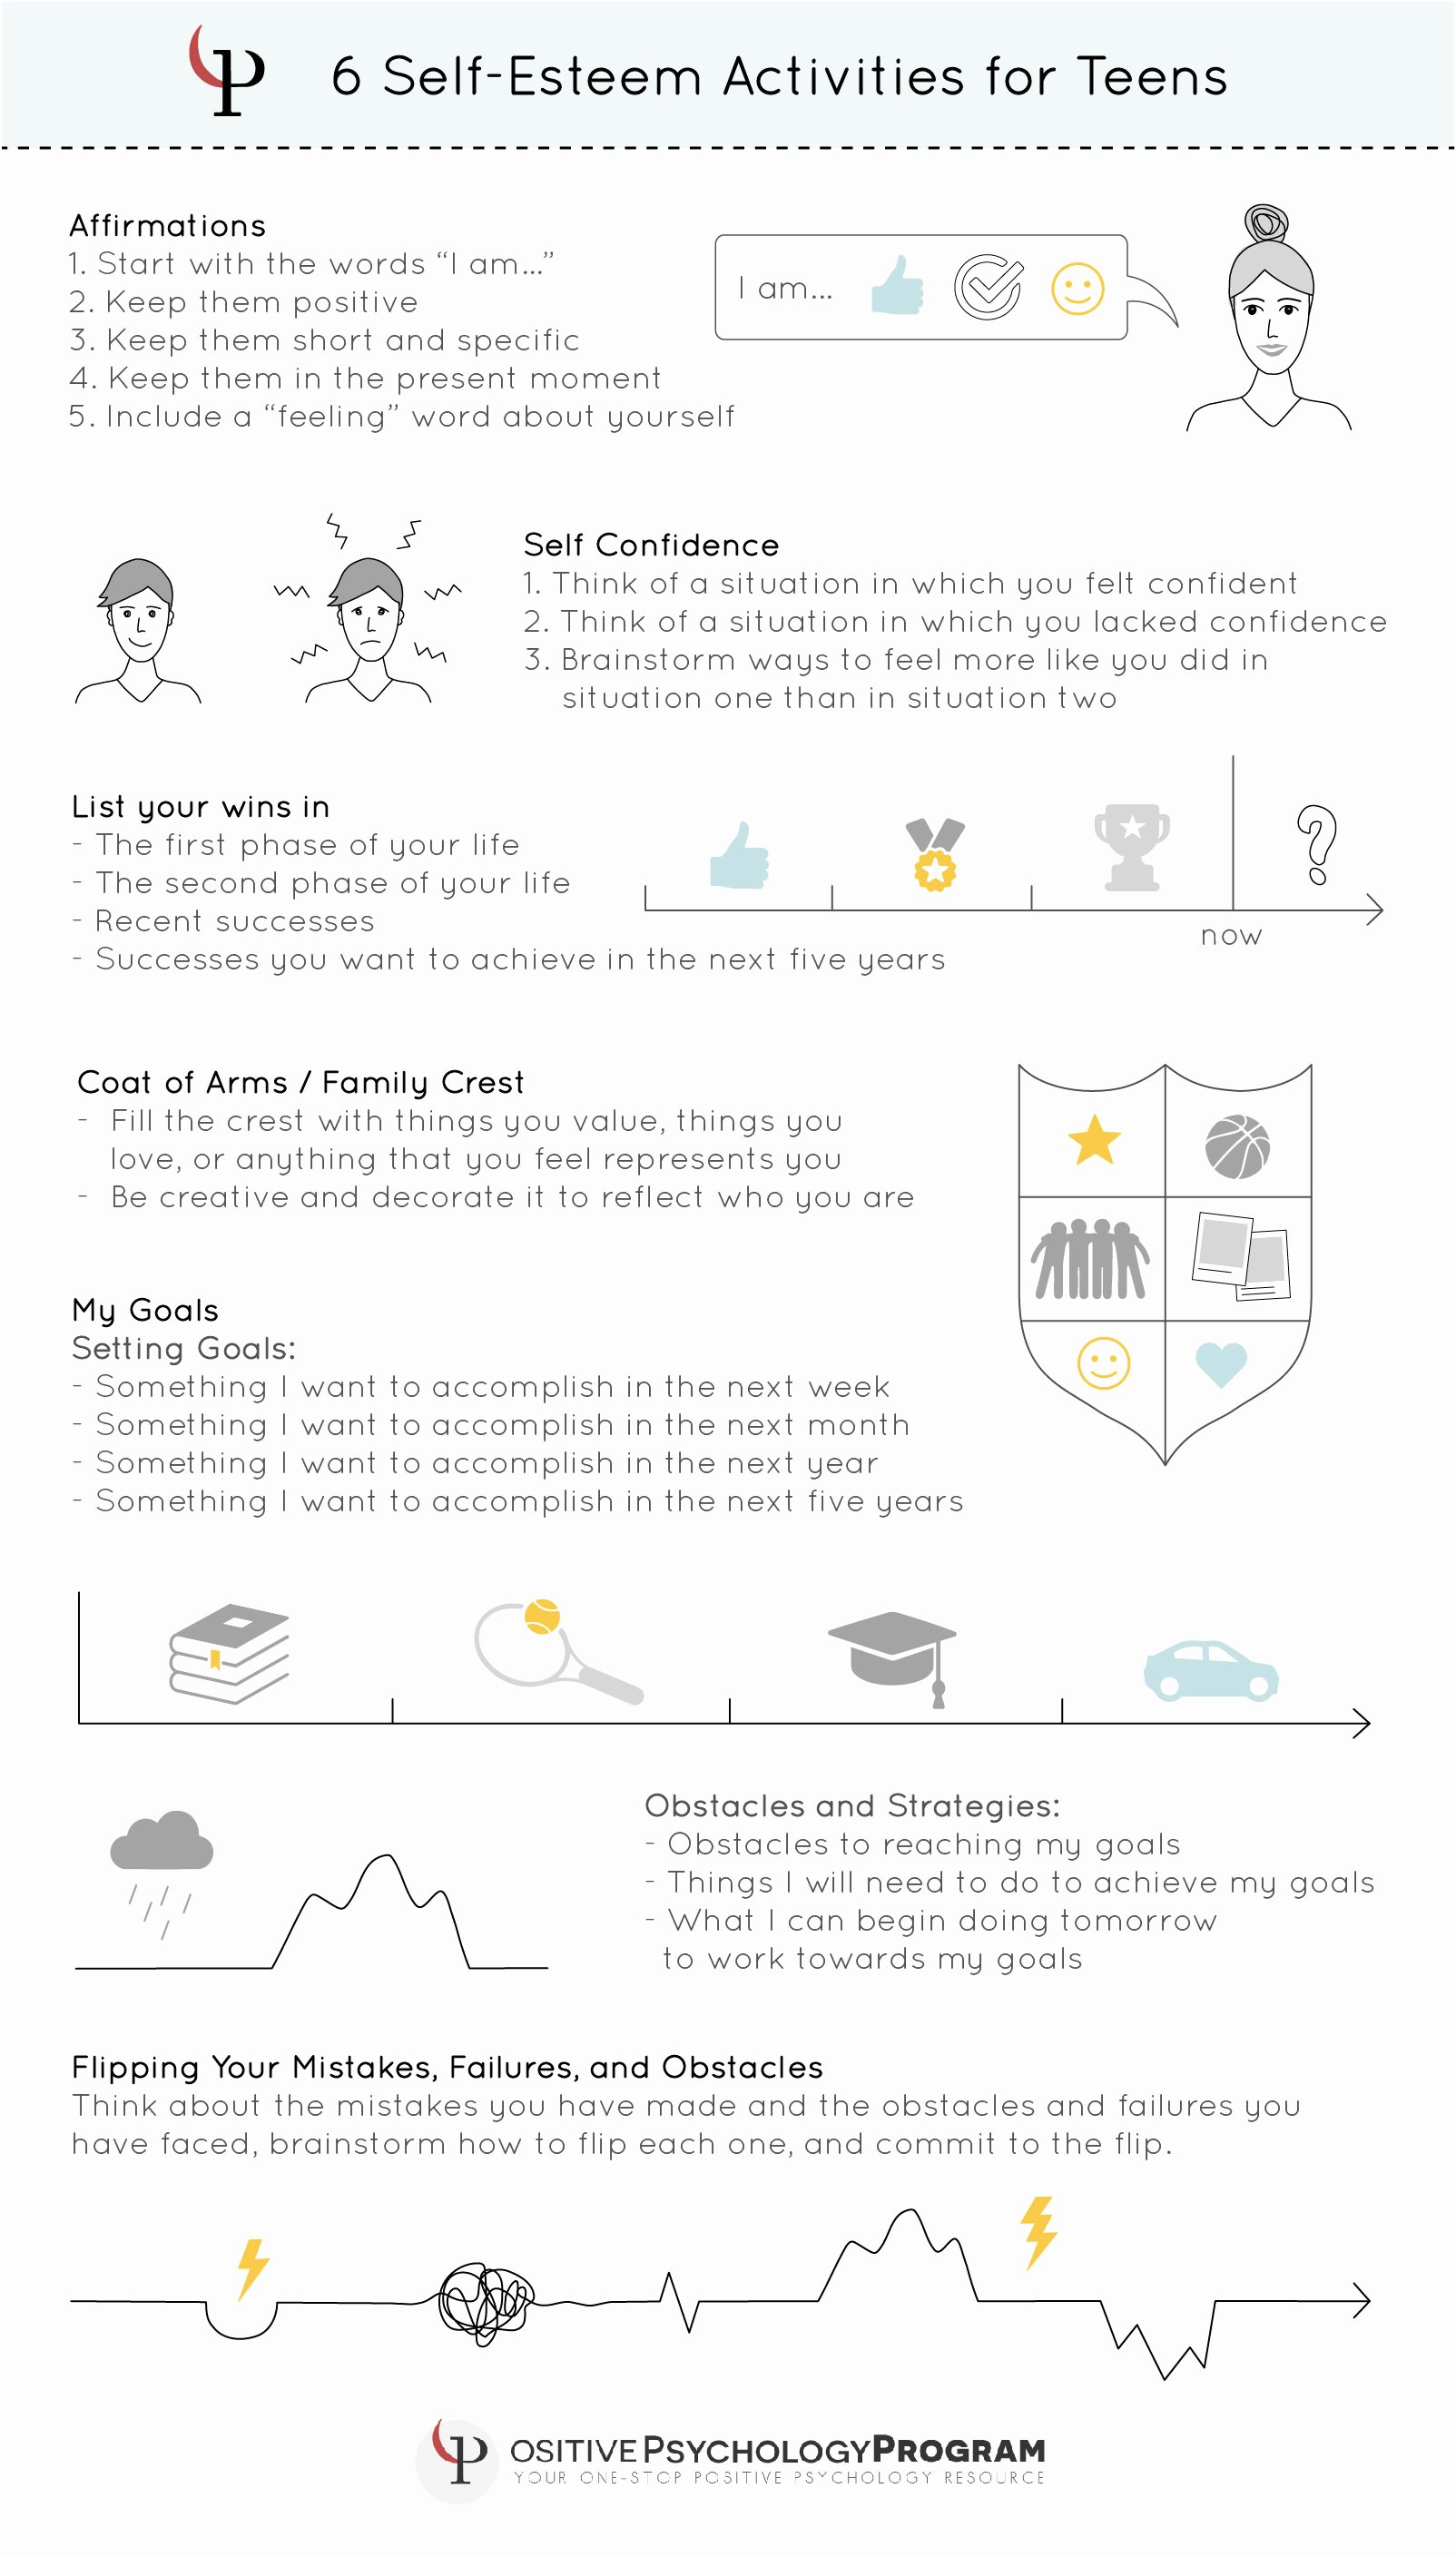 Self Esteem Worksheet for Adults Luxury 18 Self Esteem Worksheets and Activities for Teens and